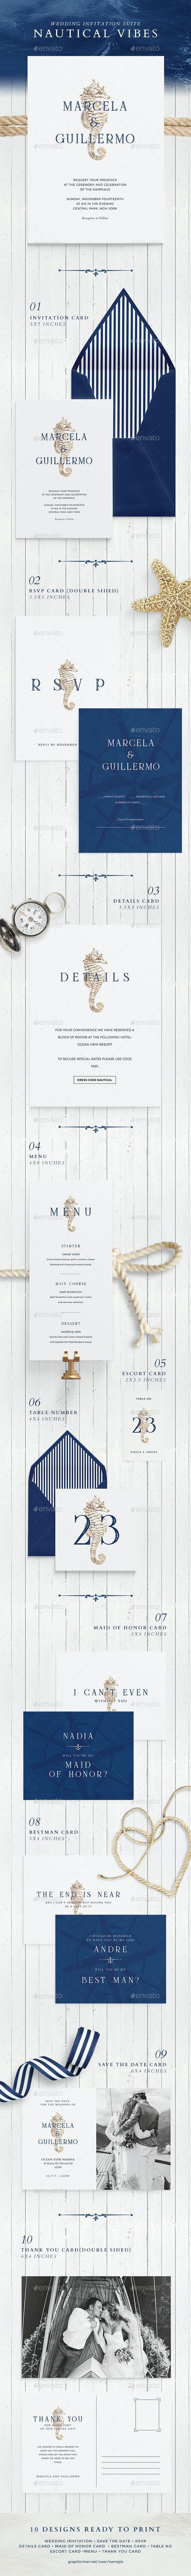 Wedding Invitation Suite - Nautical Vibes - Weddings Cards & Invites